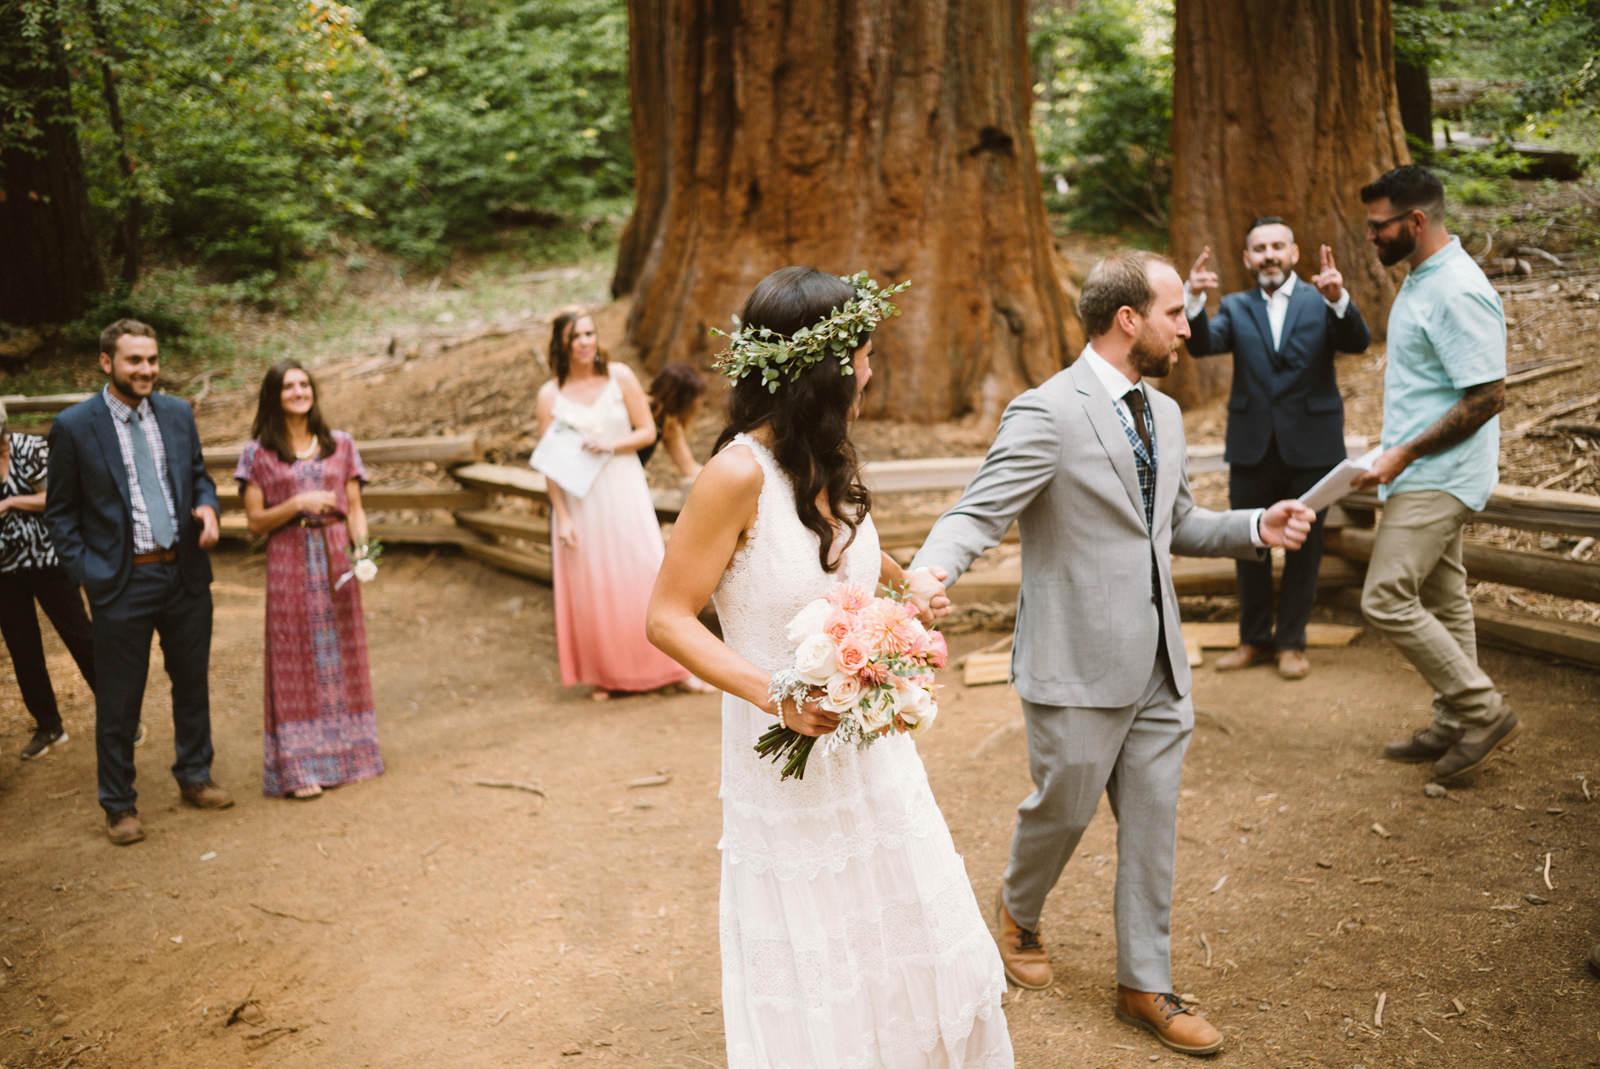 yosemite-intimate-wedding-067 YOSEMITE INTIMATE WEDDING